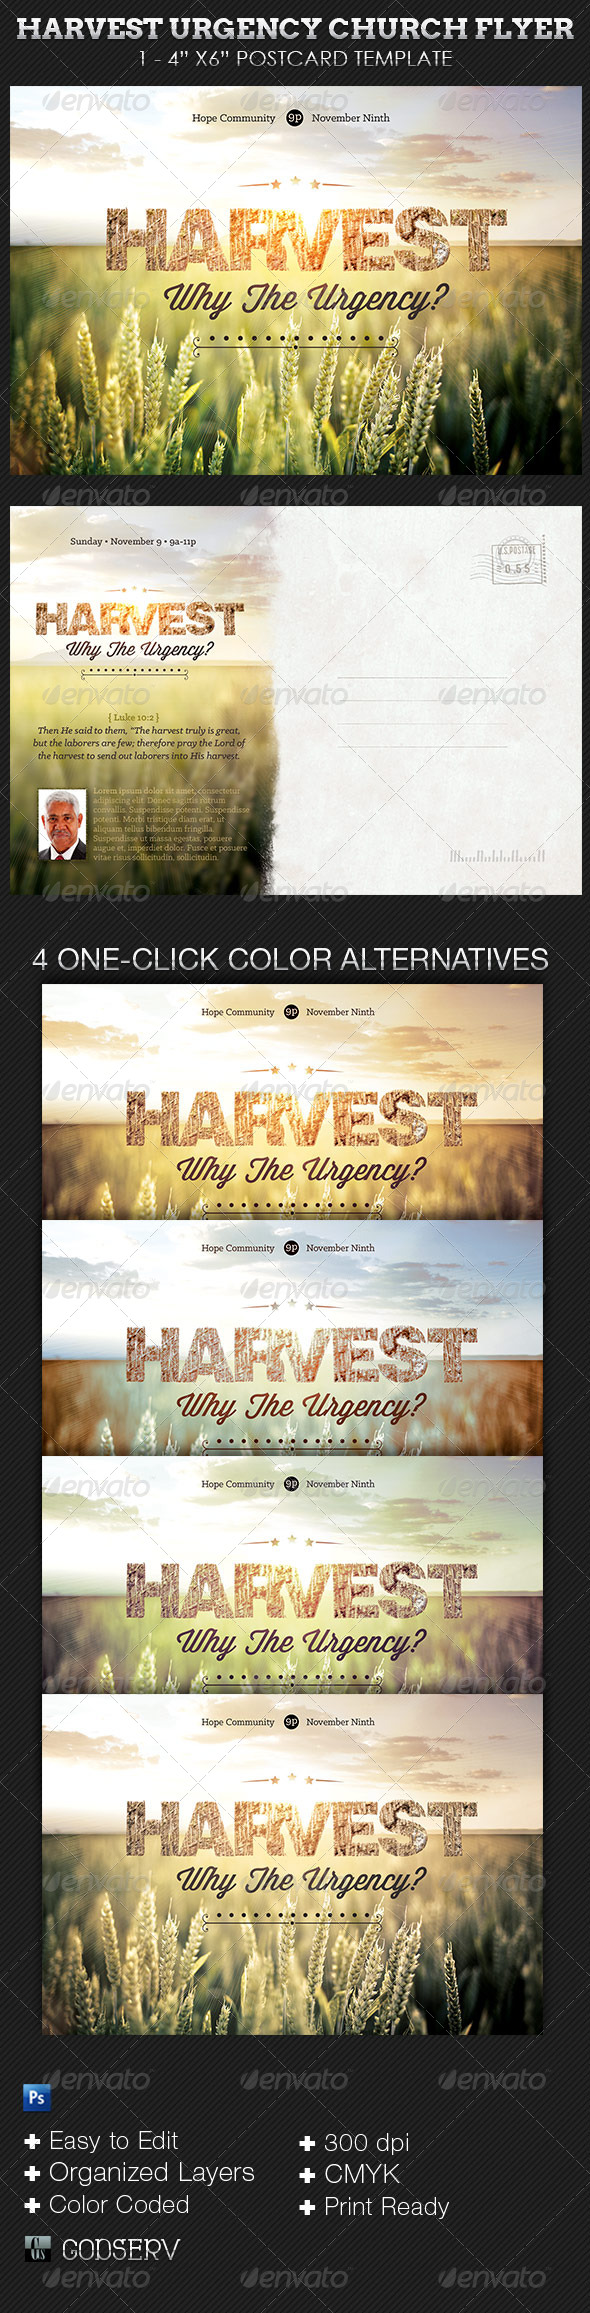 Harvest Urgency Church Flyer Postcard Template - Church Flyers